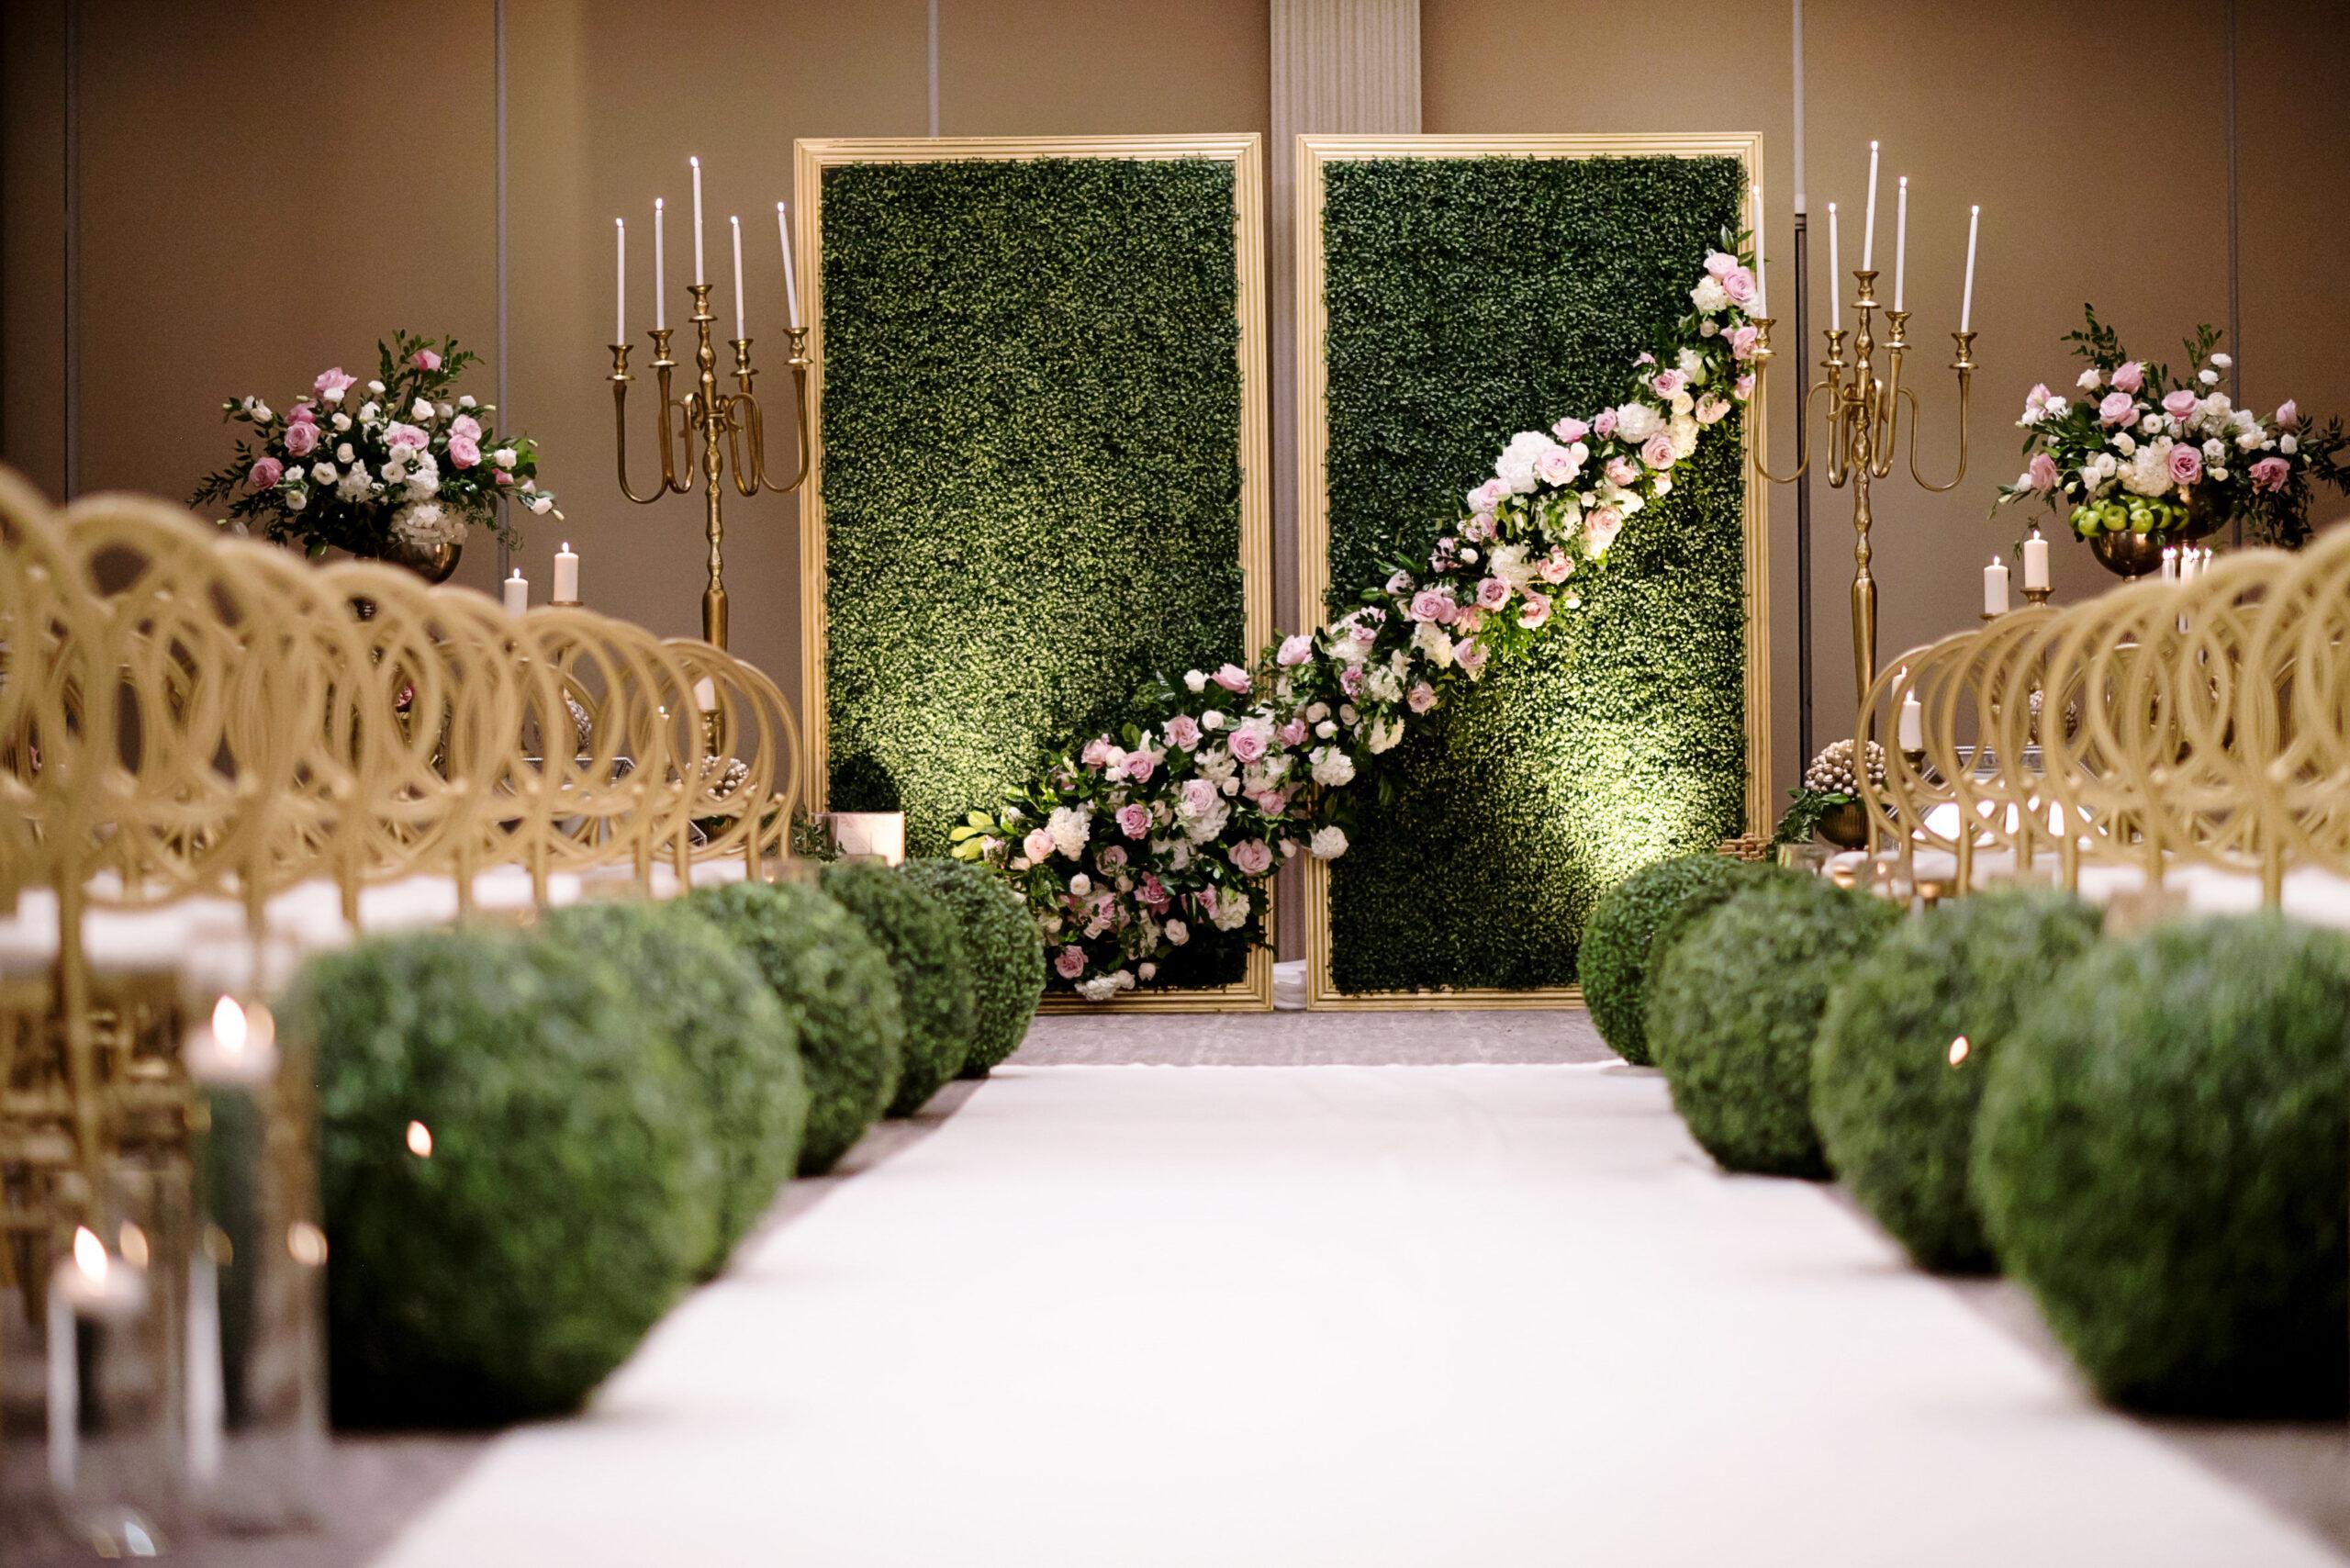 https://secureservercdn.net/45.40.145.151/kgq.ab5.myftpupload.com/wp-content/uploads/2020/04/Sanam-Soroush-s-Wedding-wedluxe-submission-0036-scaled.jpg?time=1627956768